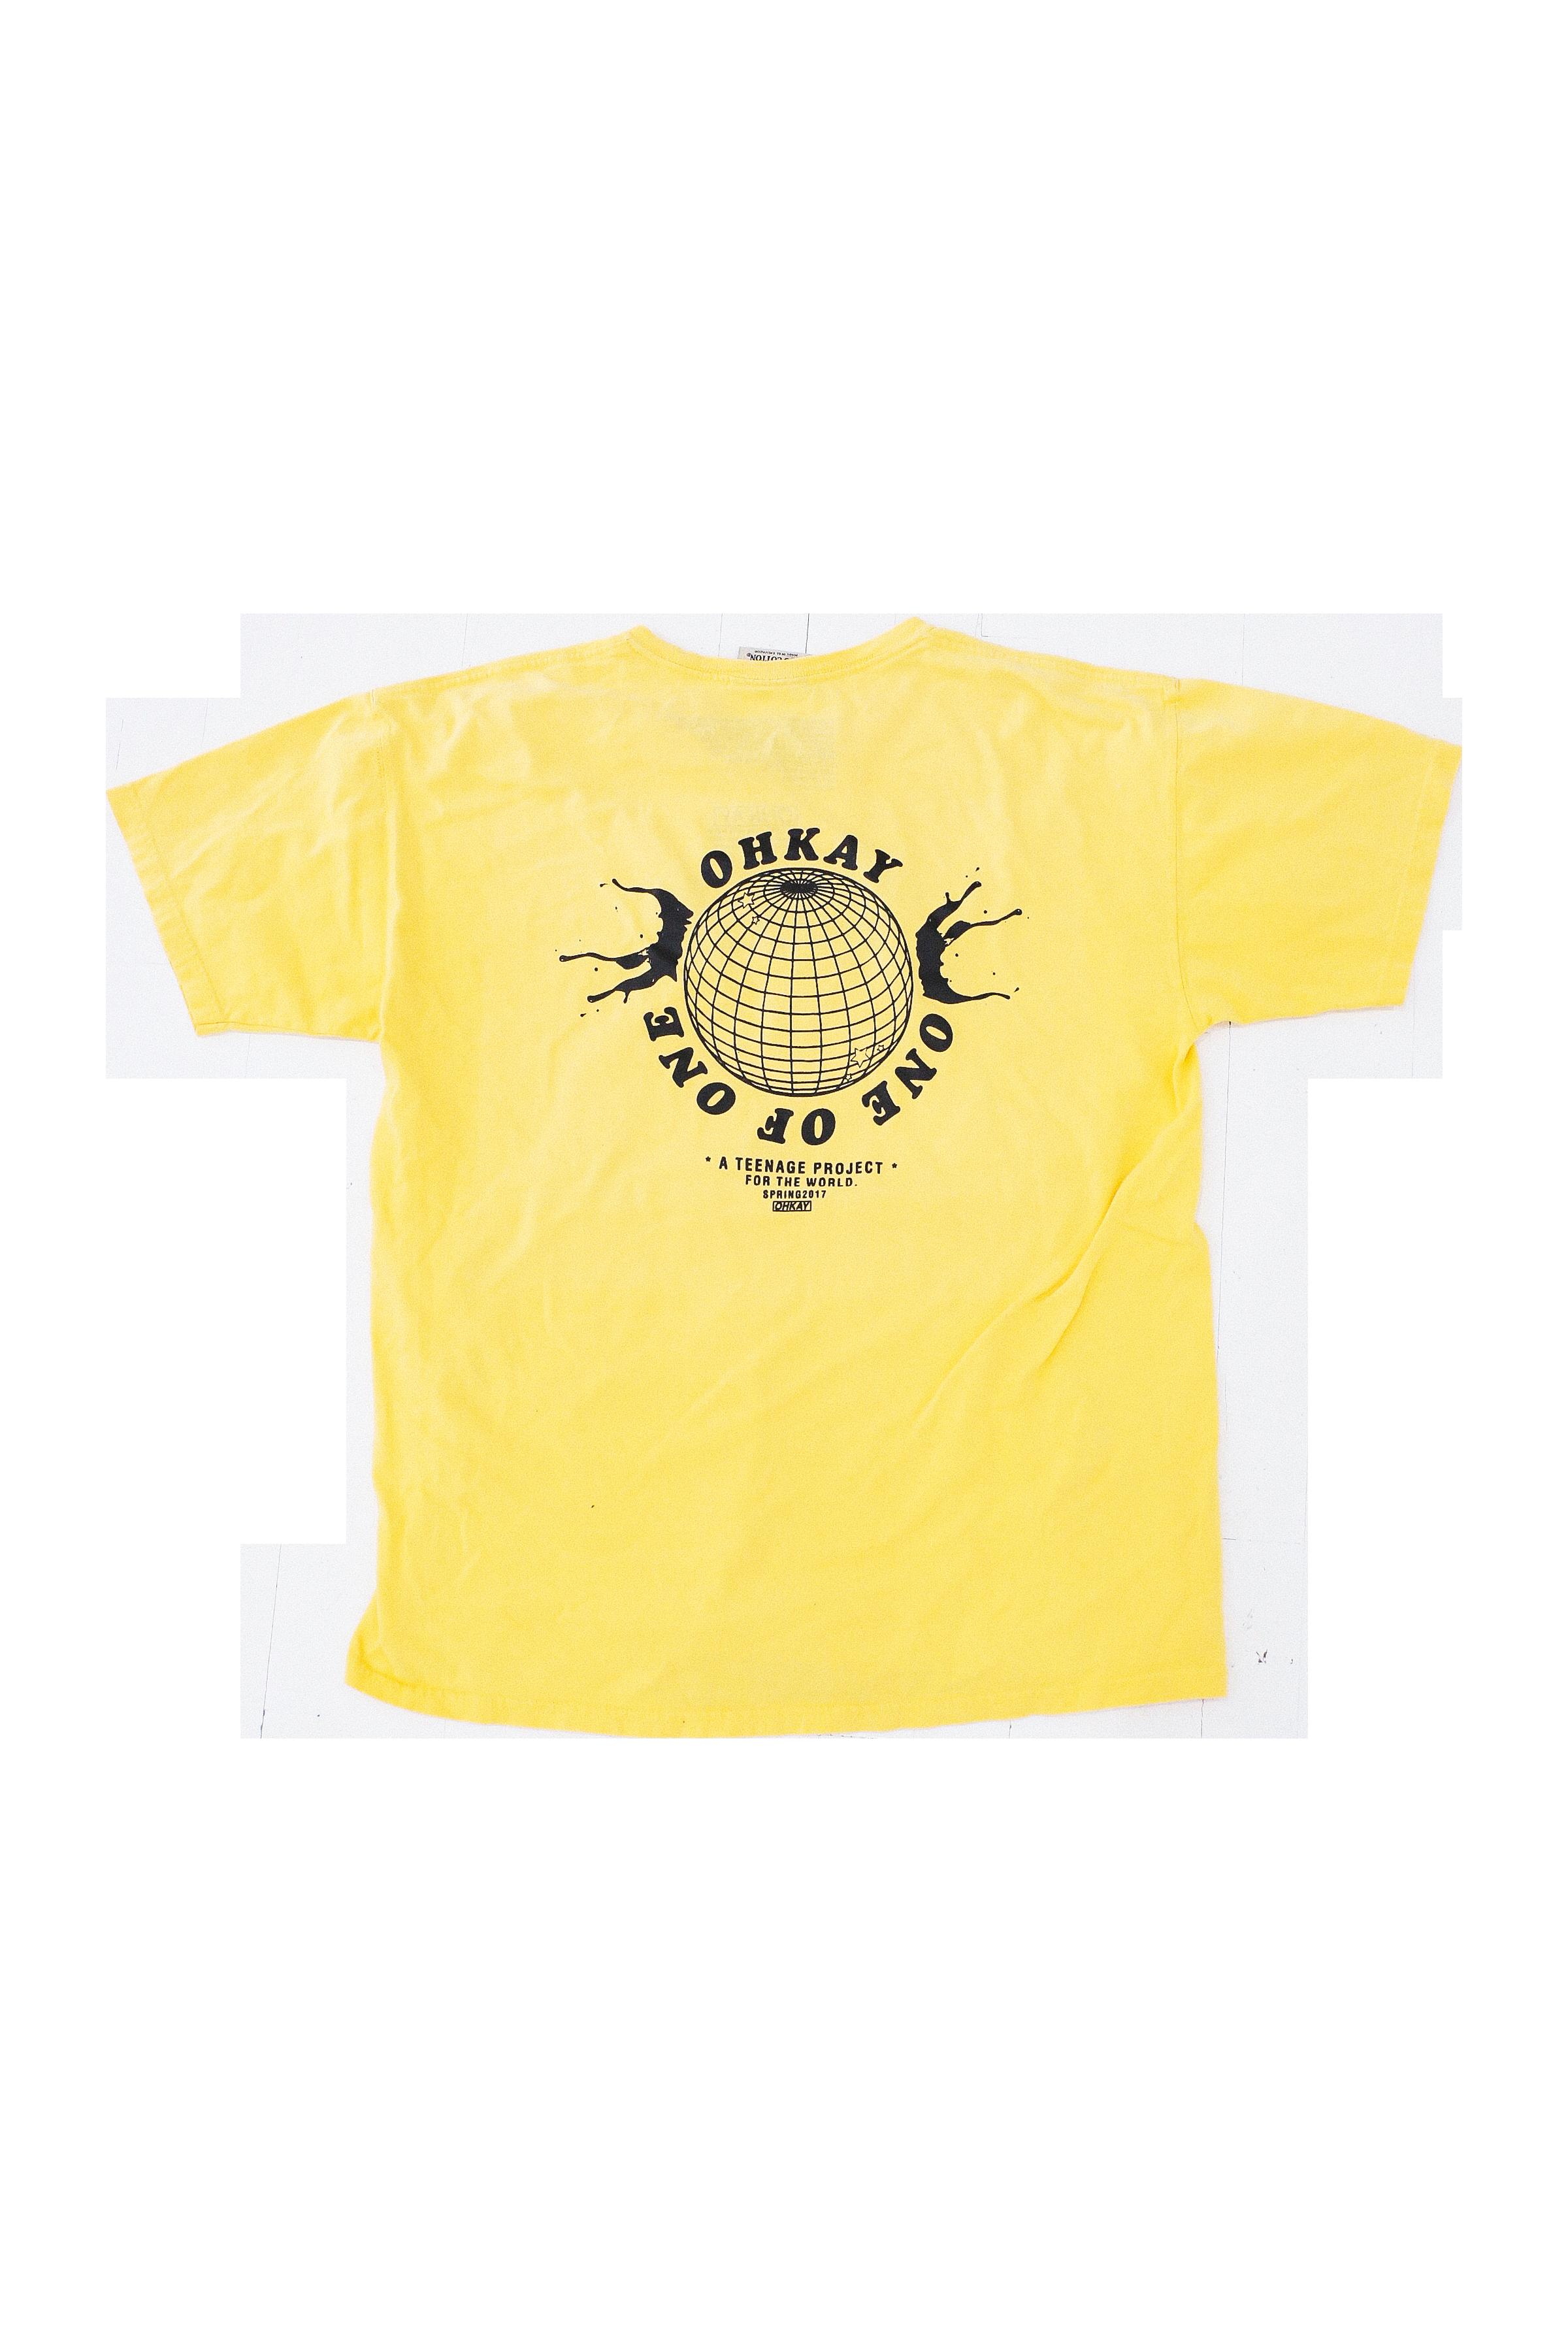 yellow shirt back.png